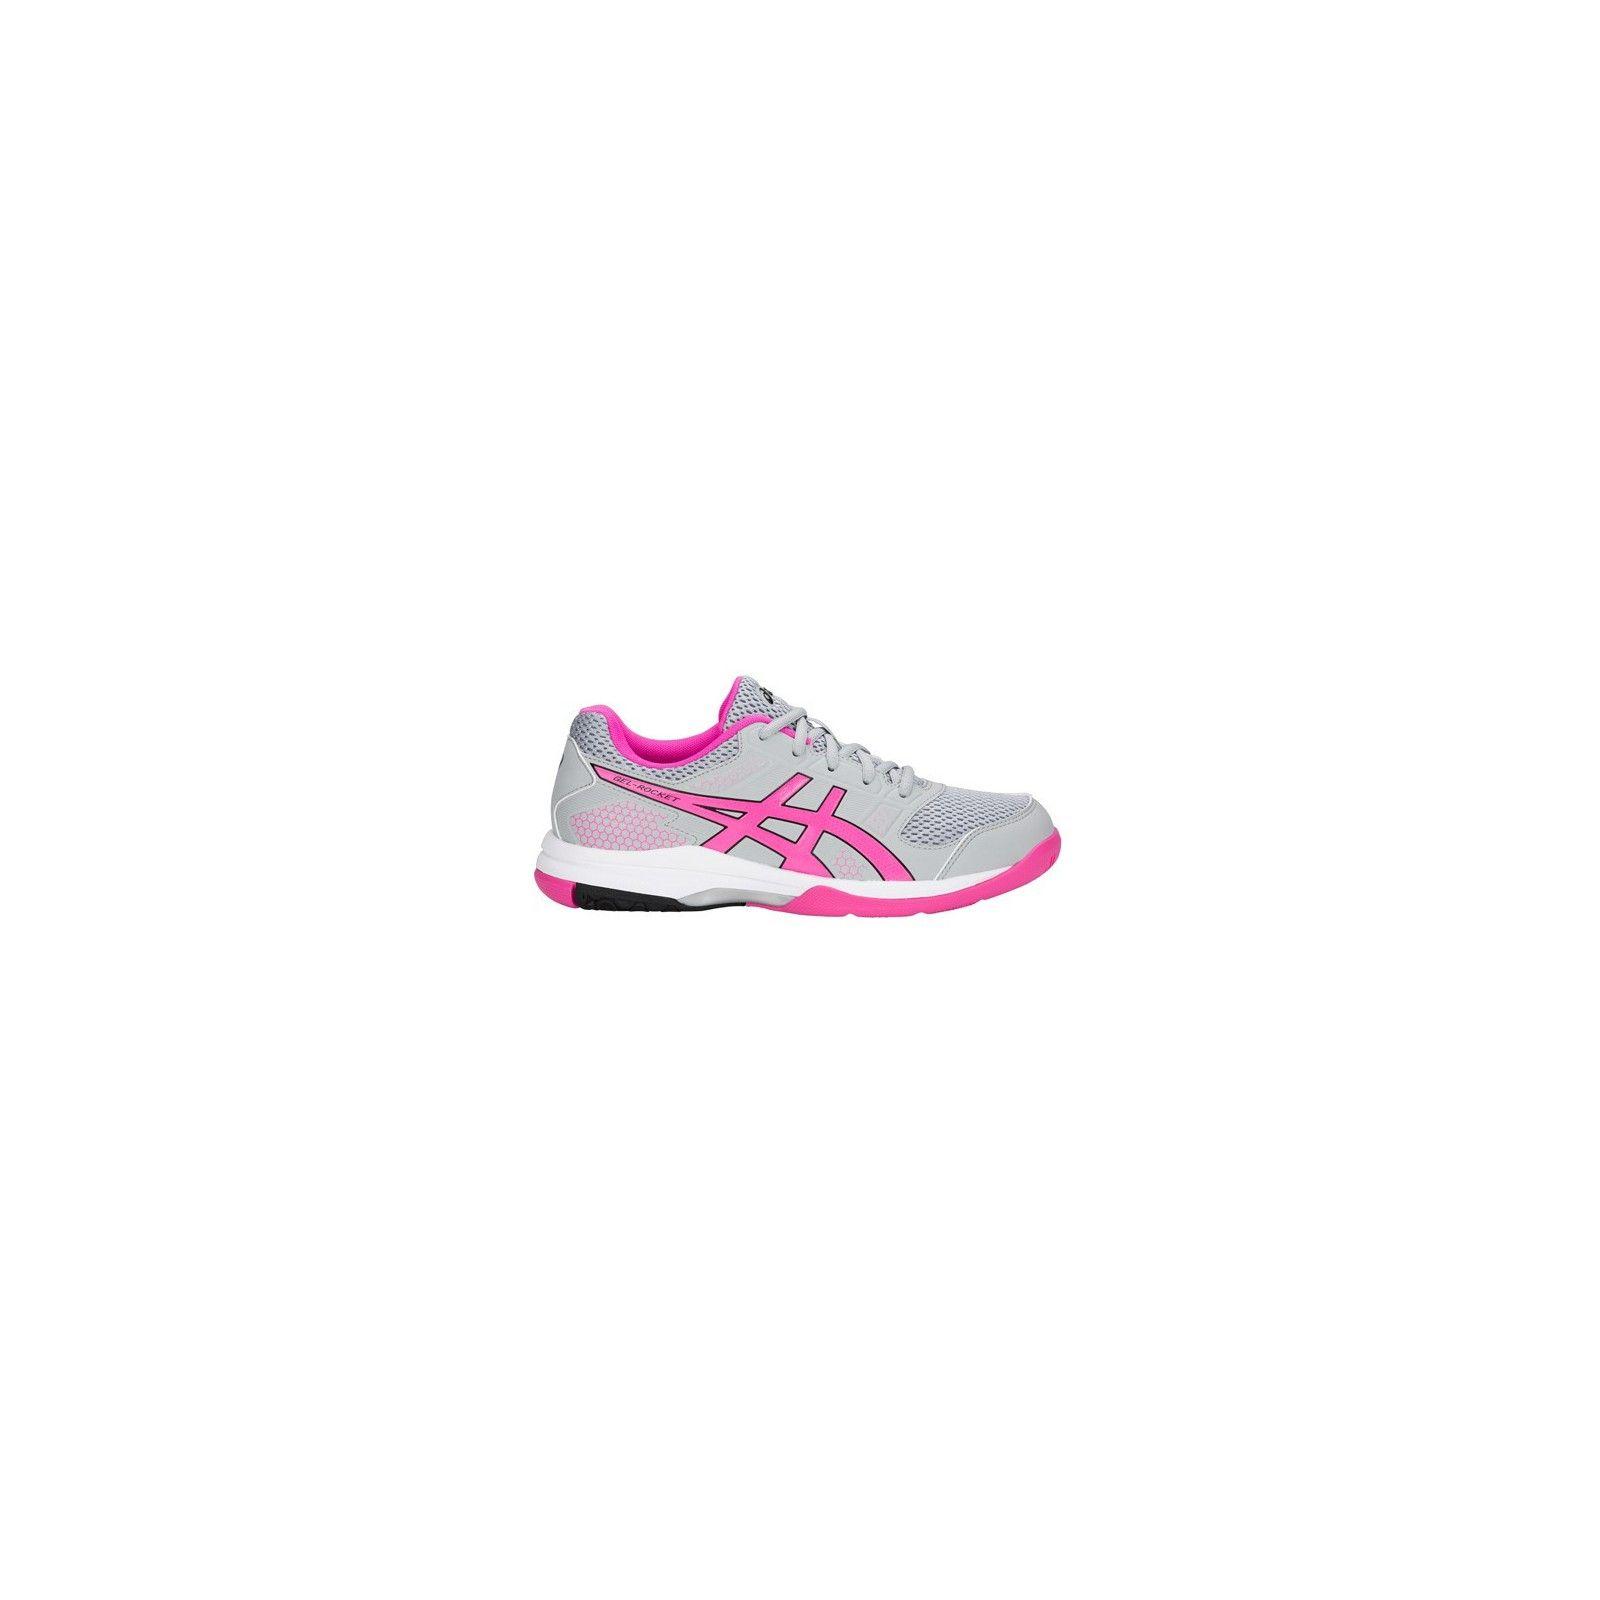 Asics Gel Rocket 8 Women Mid Grey Pink